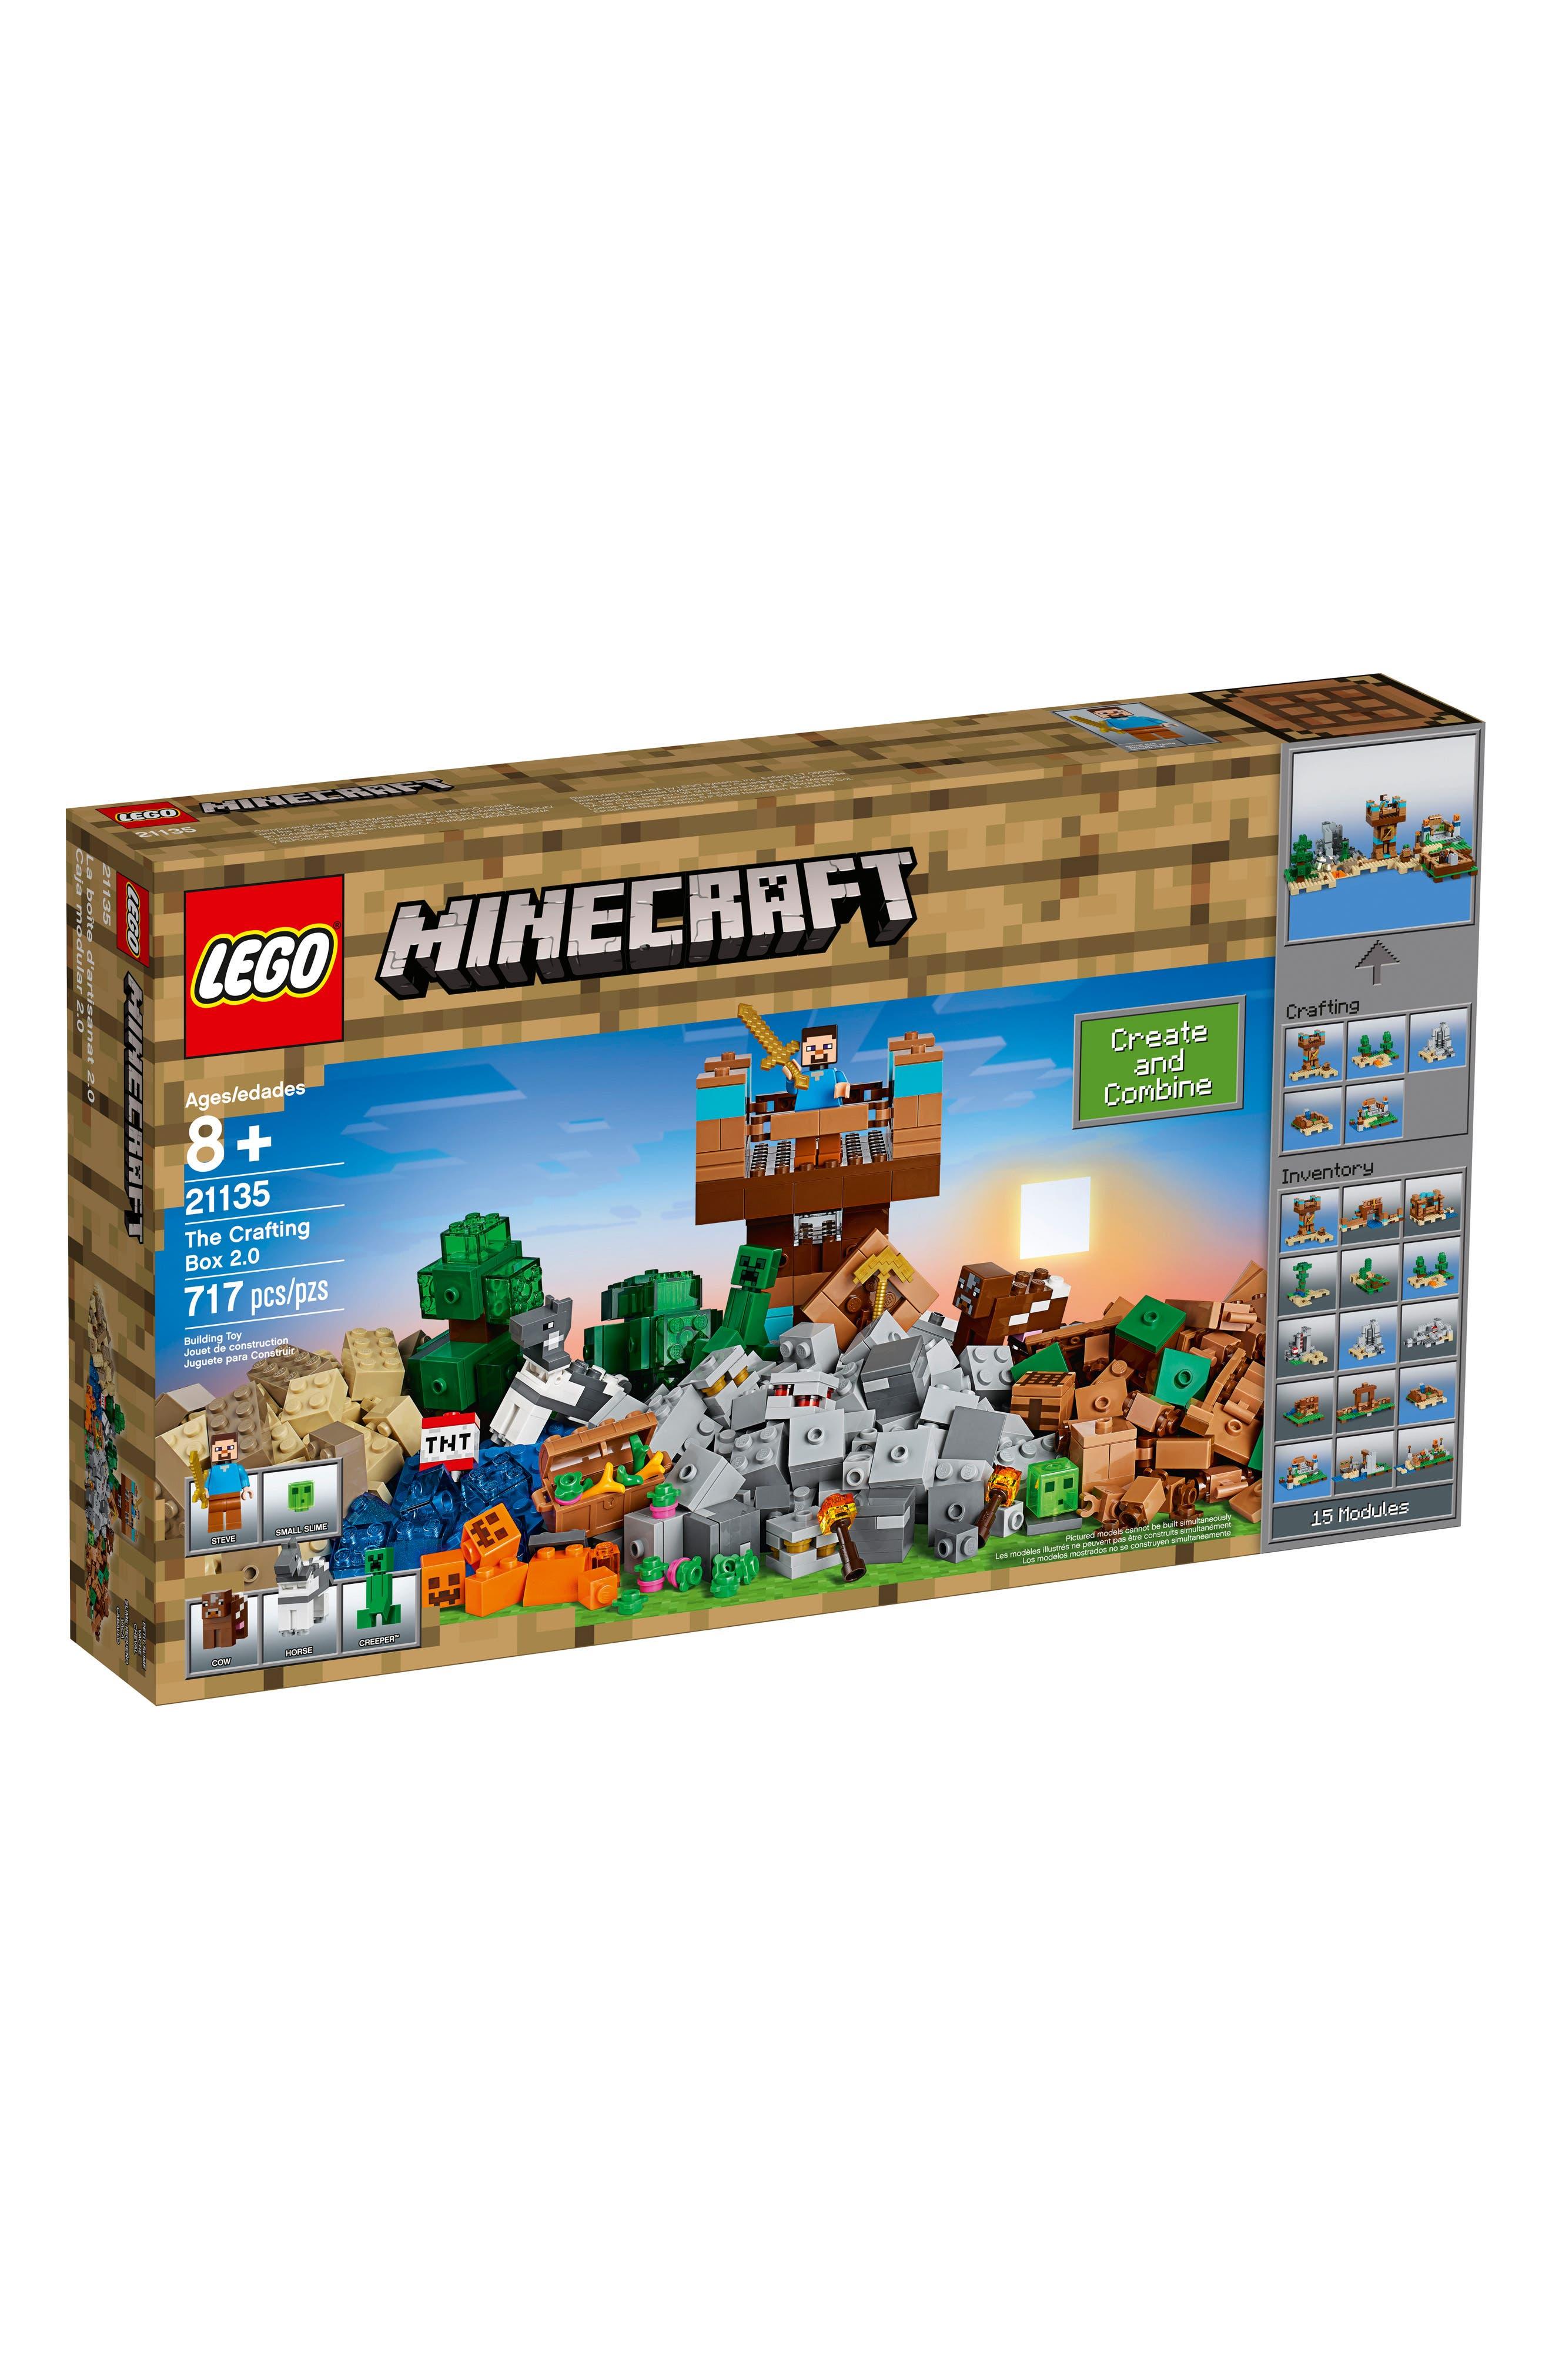 Minecraft<sup>™</sup> The Crafting Box 2.0 Play Set - 21135,                             Main thumbnail 1, color,                             020